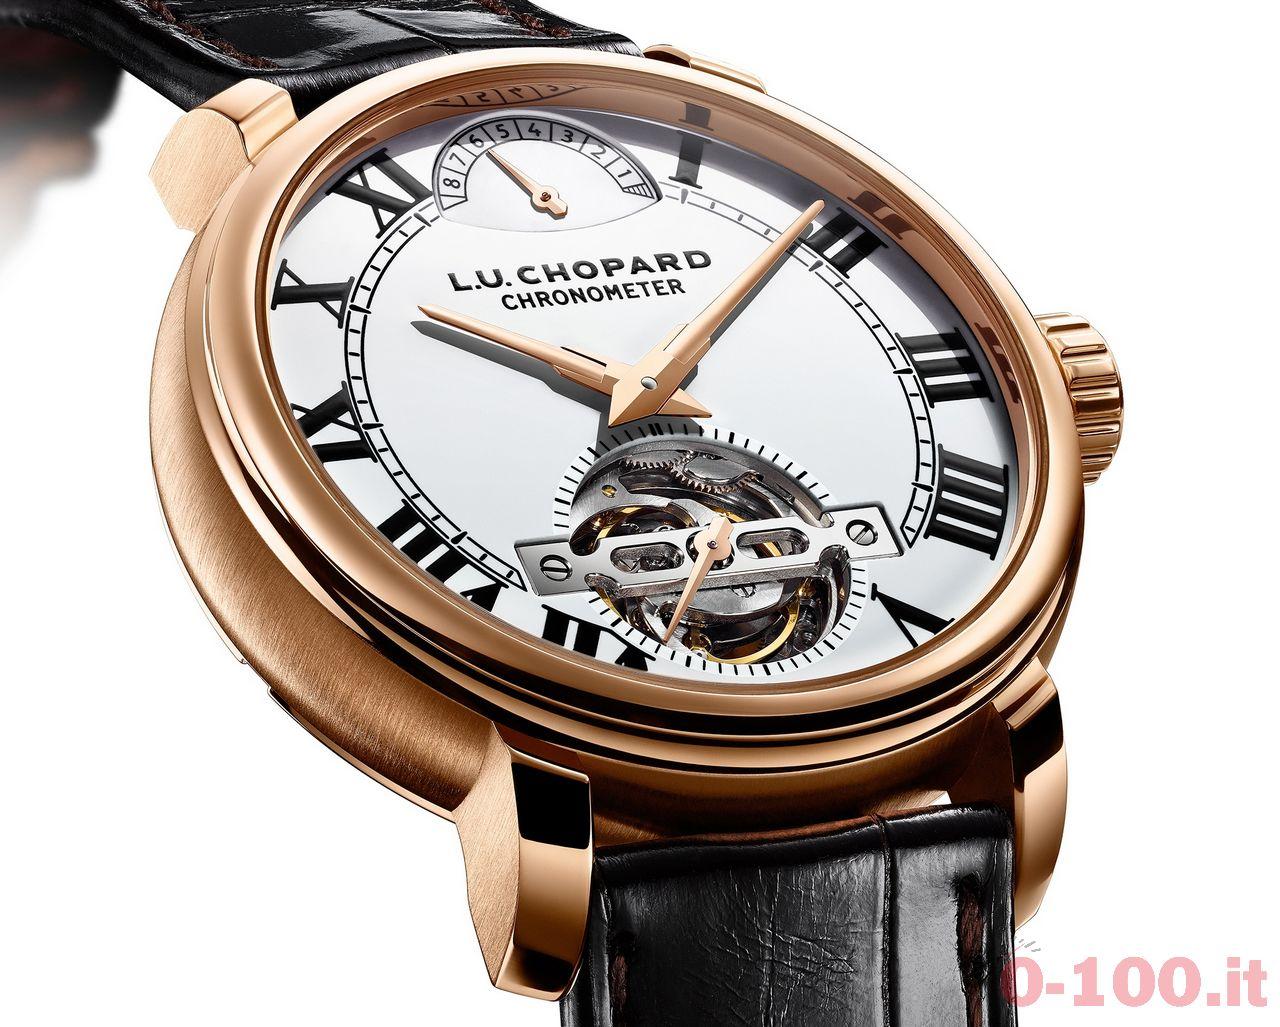 chopard-l-u-c-1963-tourbillon-ref-161970-5001-price_0-1001